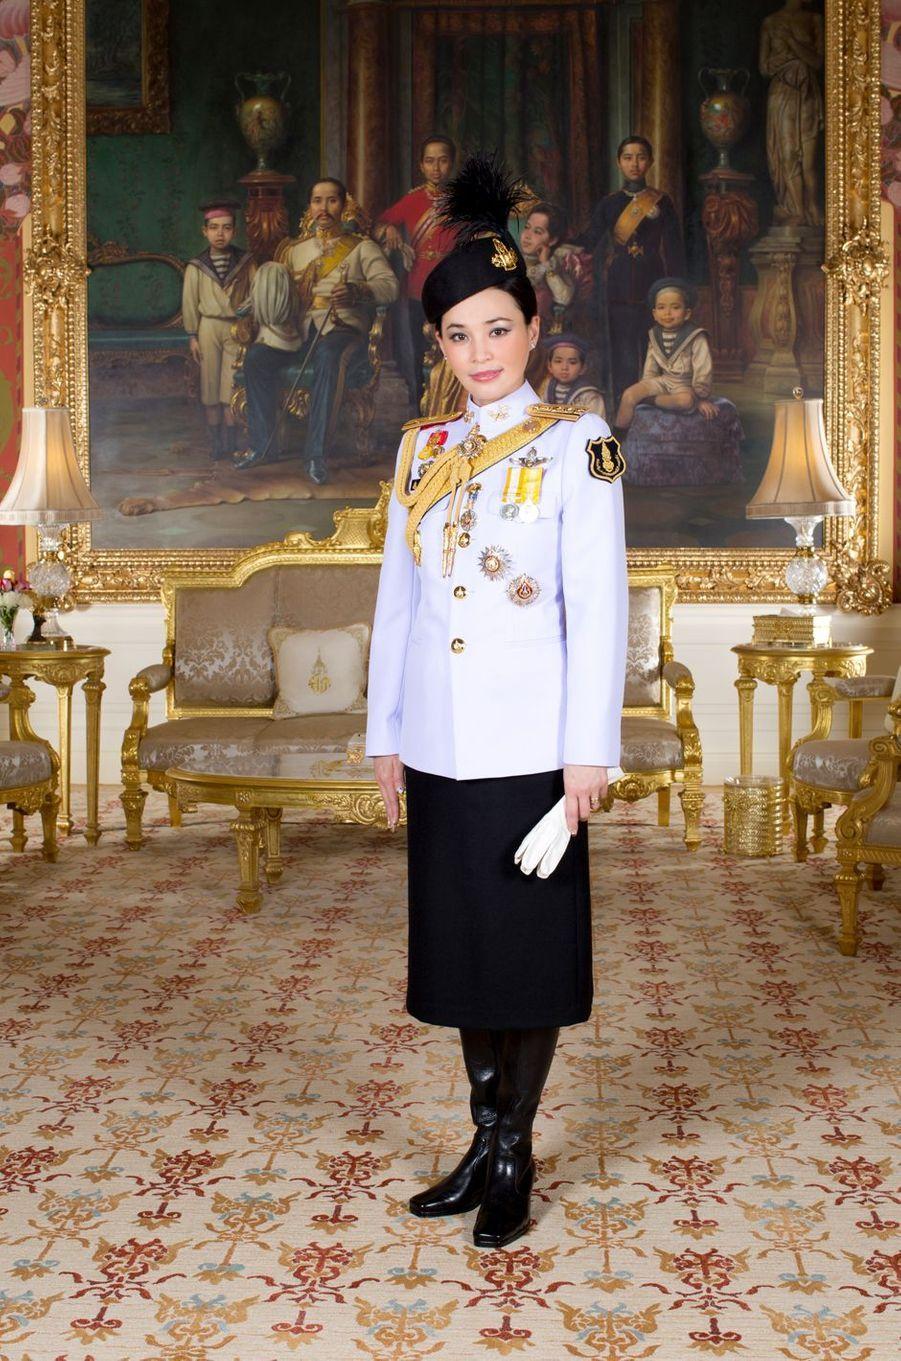 La reine Suthida de Thaïlande, épouse du roi Maha Vajiralongkorn (Rama X). Portrait diffusé le 17 mai 2019